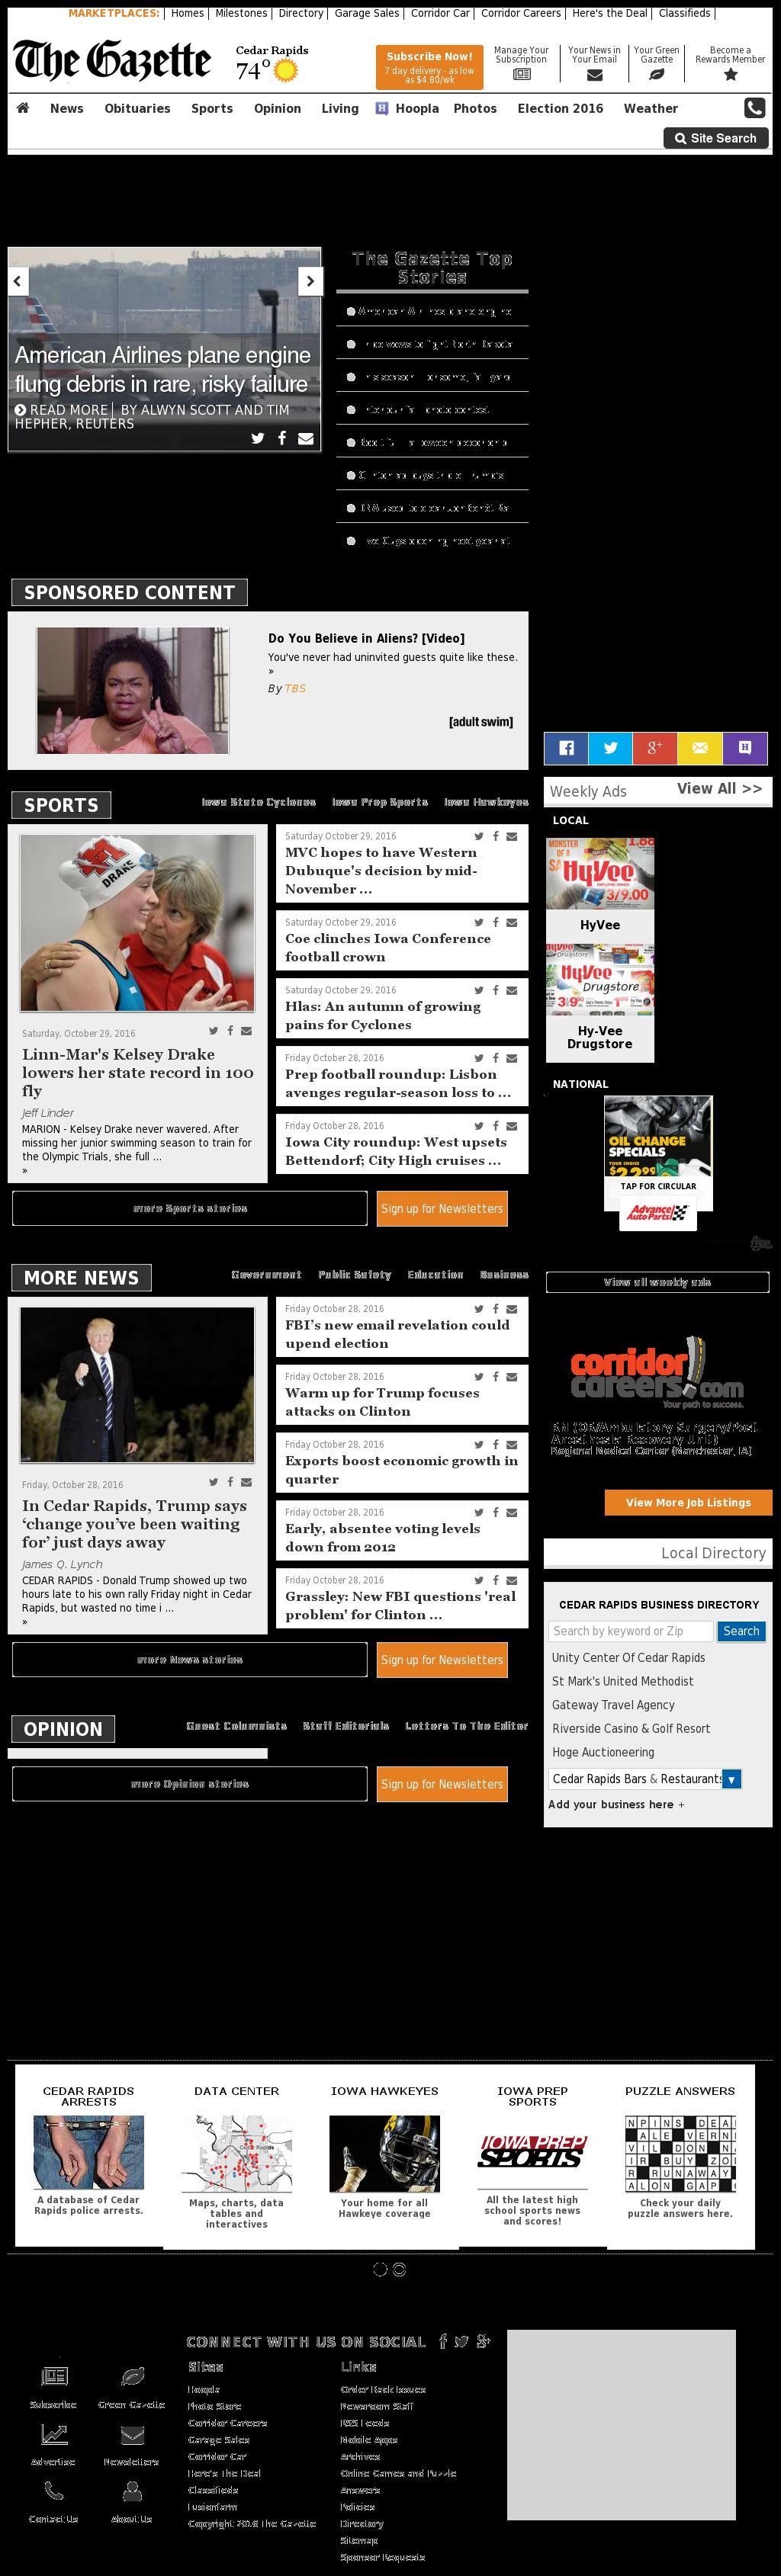 The (Cedar Rapids) Gazette at Saturday Oct. 29, 2016, 11:06 p.m. UTC